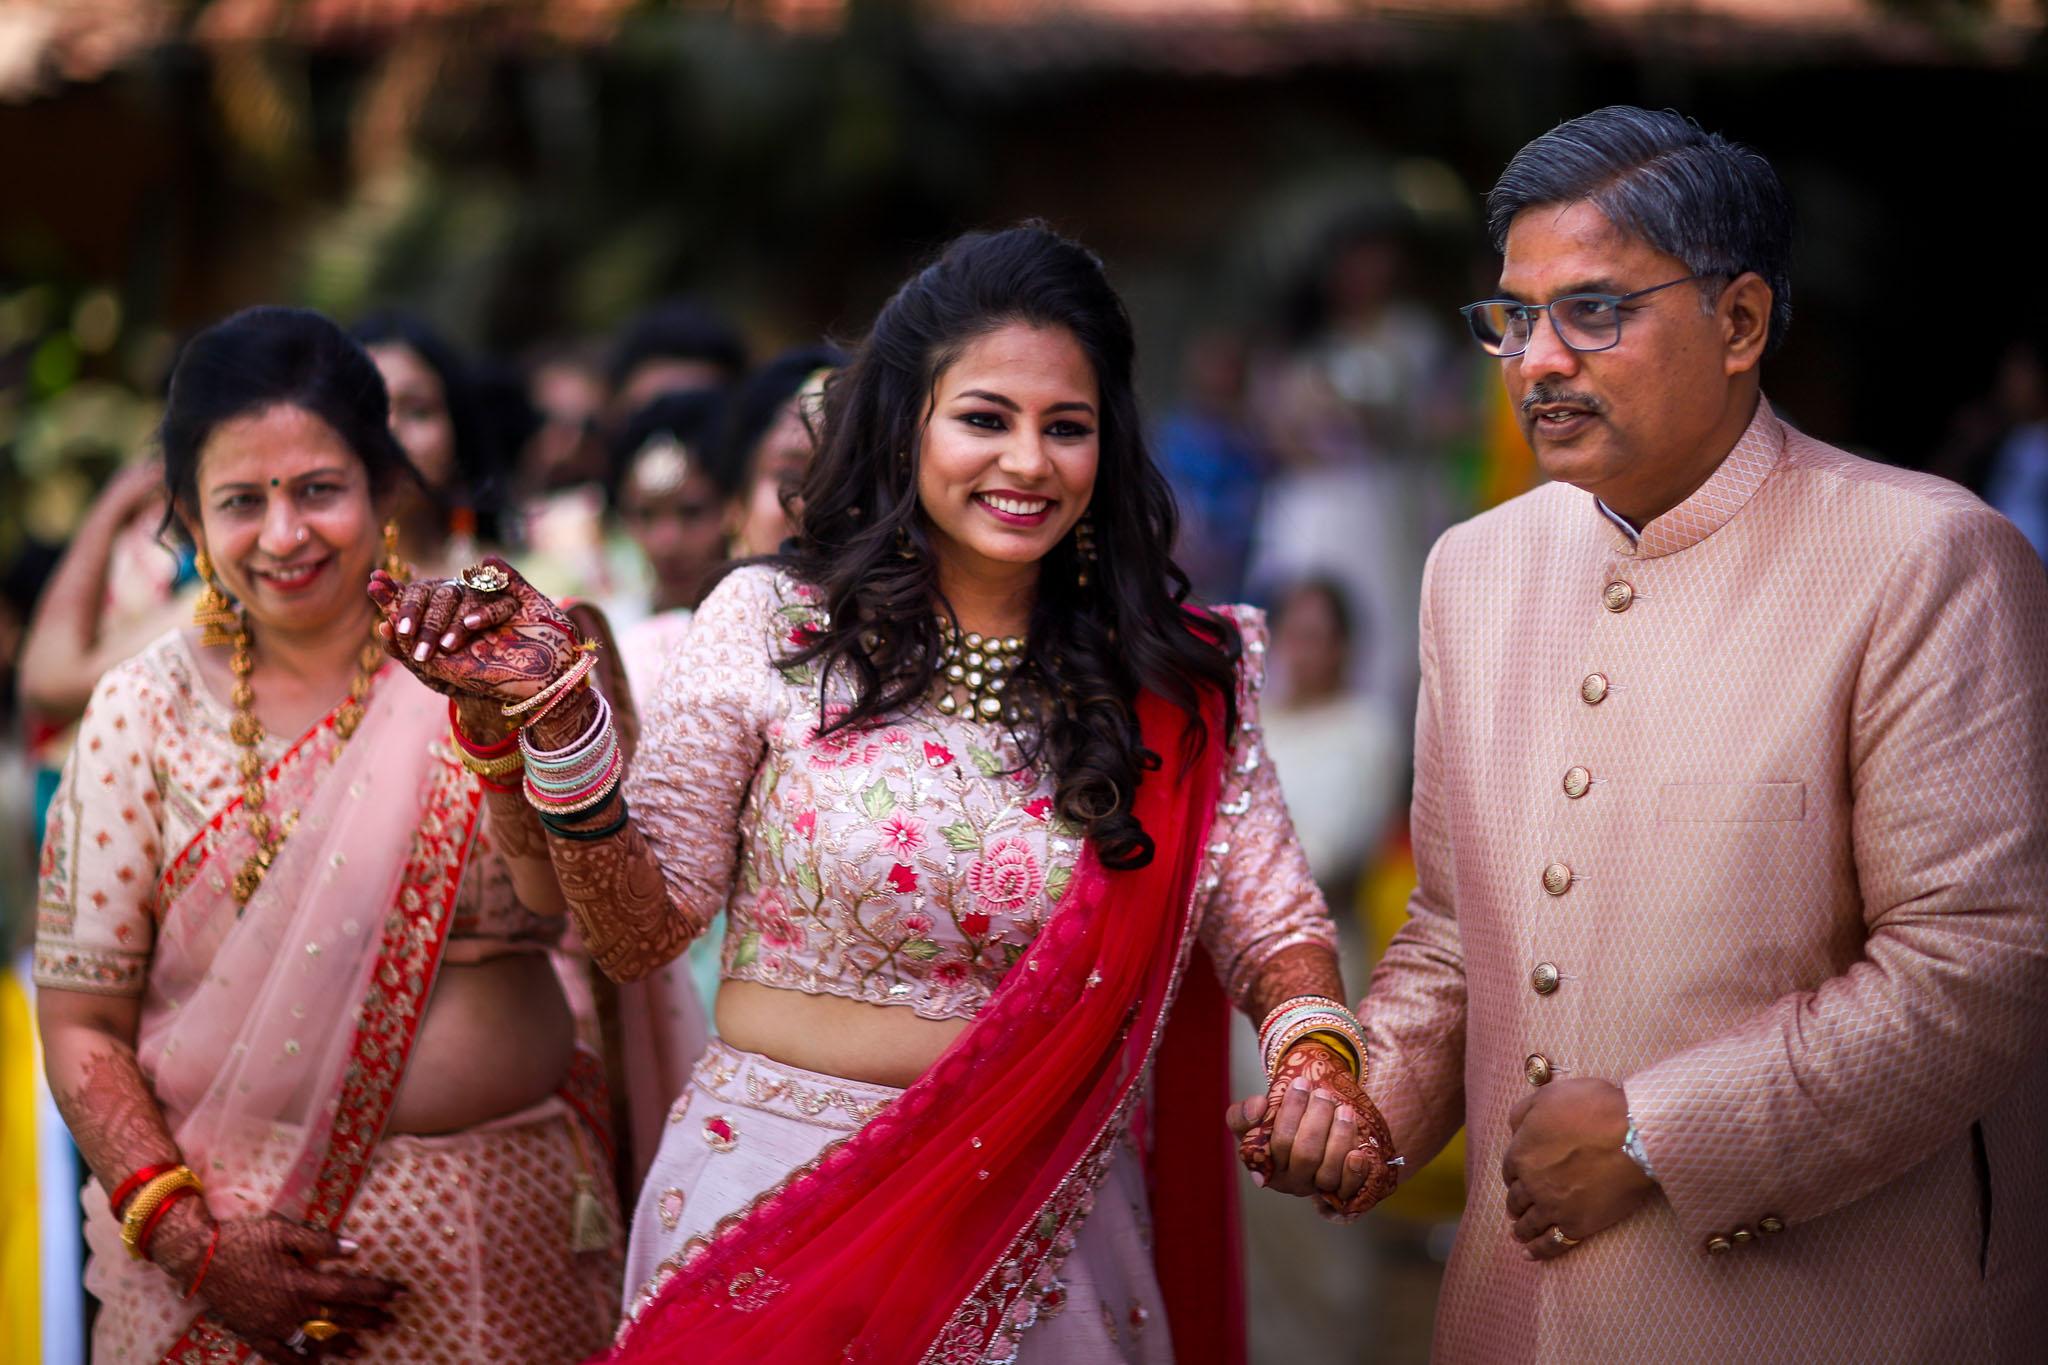 Mukti x Ojas Wedding Akshjay Sansare Photography Best wedding photographer in mumbai India Candid Cinematic Films videos-35.jpg